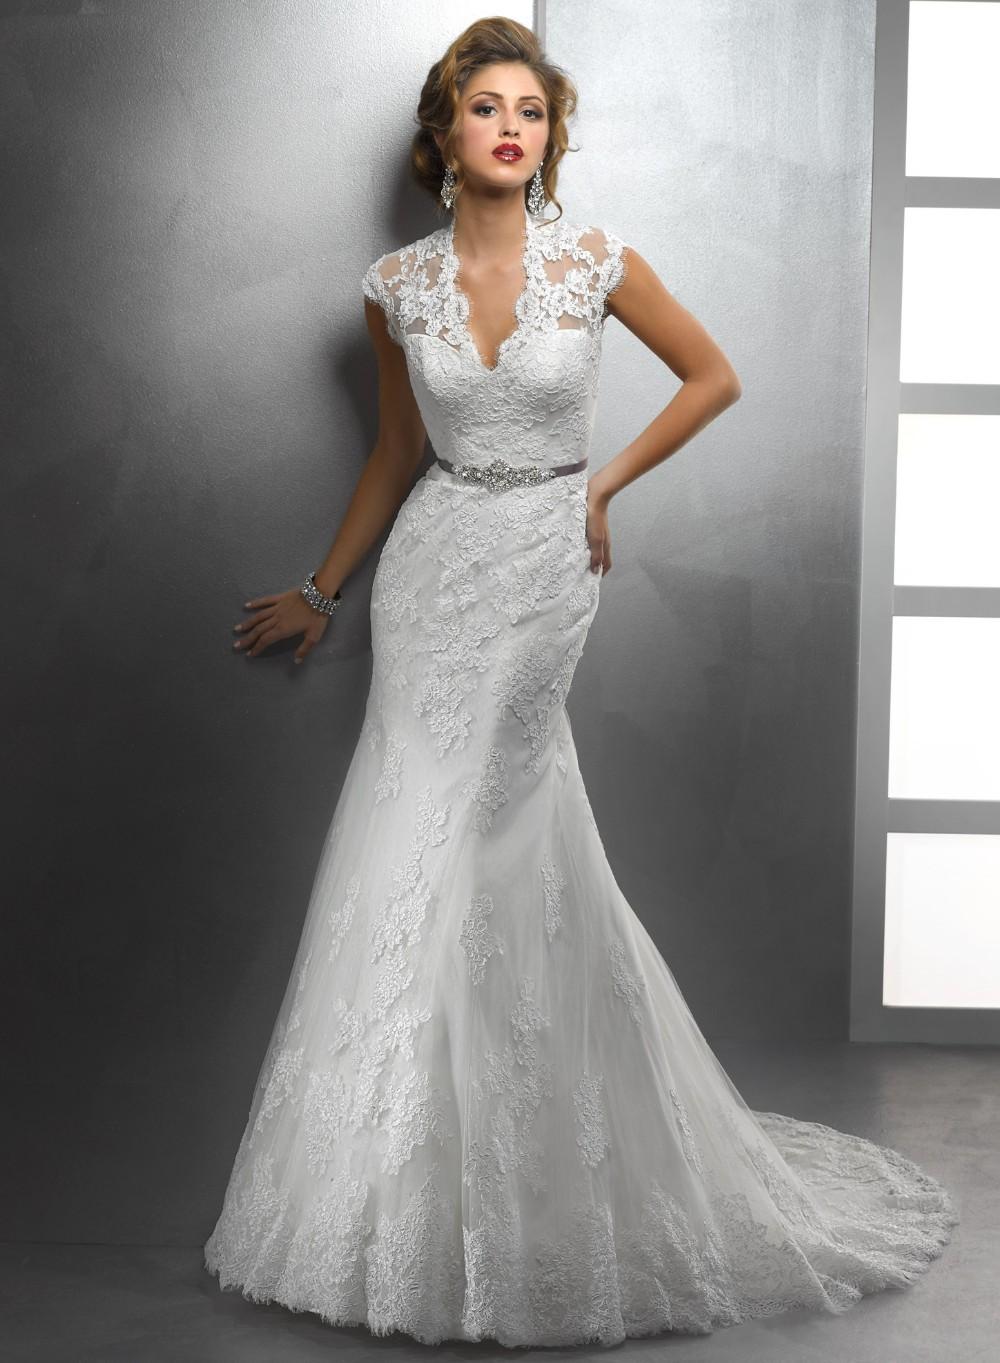 2015-Vestidos-Elegant-Design-V-Neck-Cap-Sleeve-Appliqued ... Lace Mermaid Wedding Dress